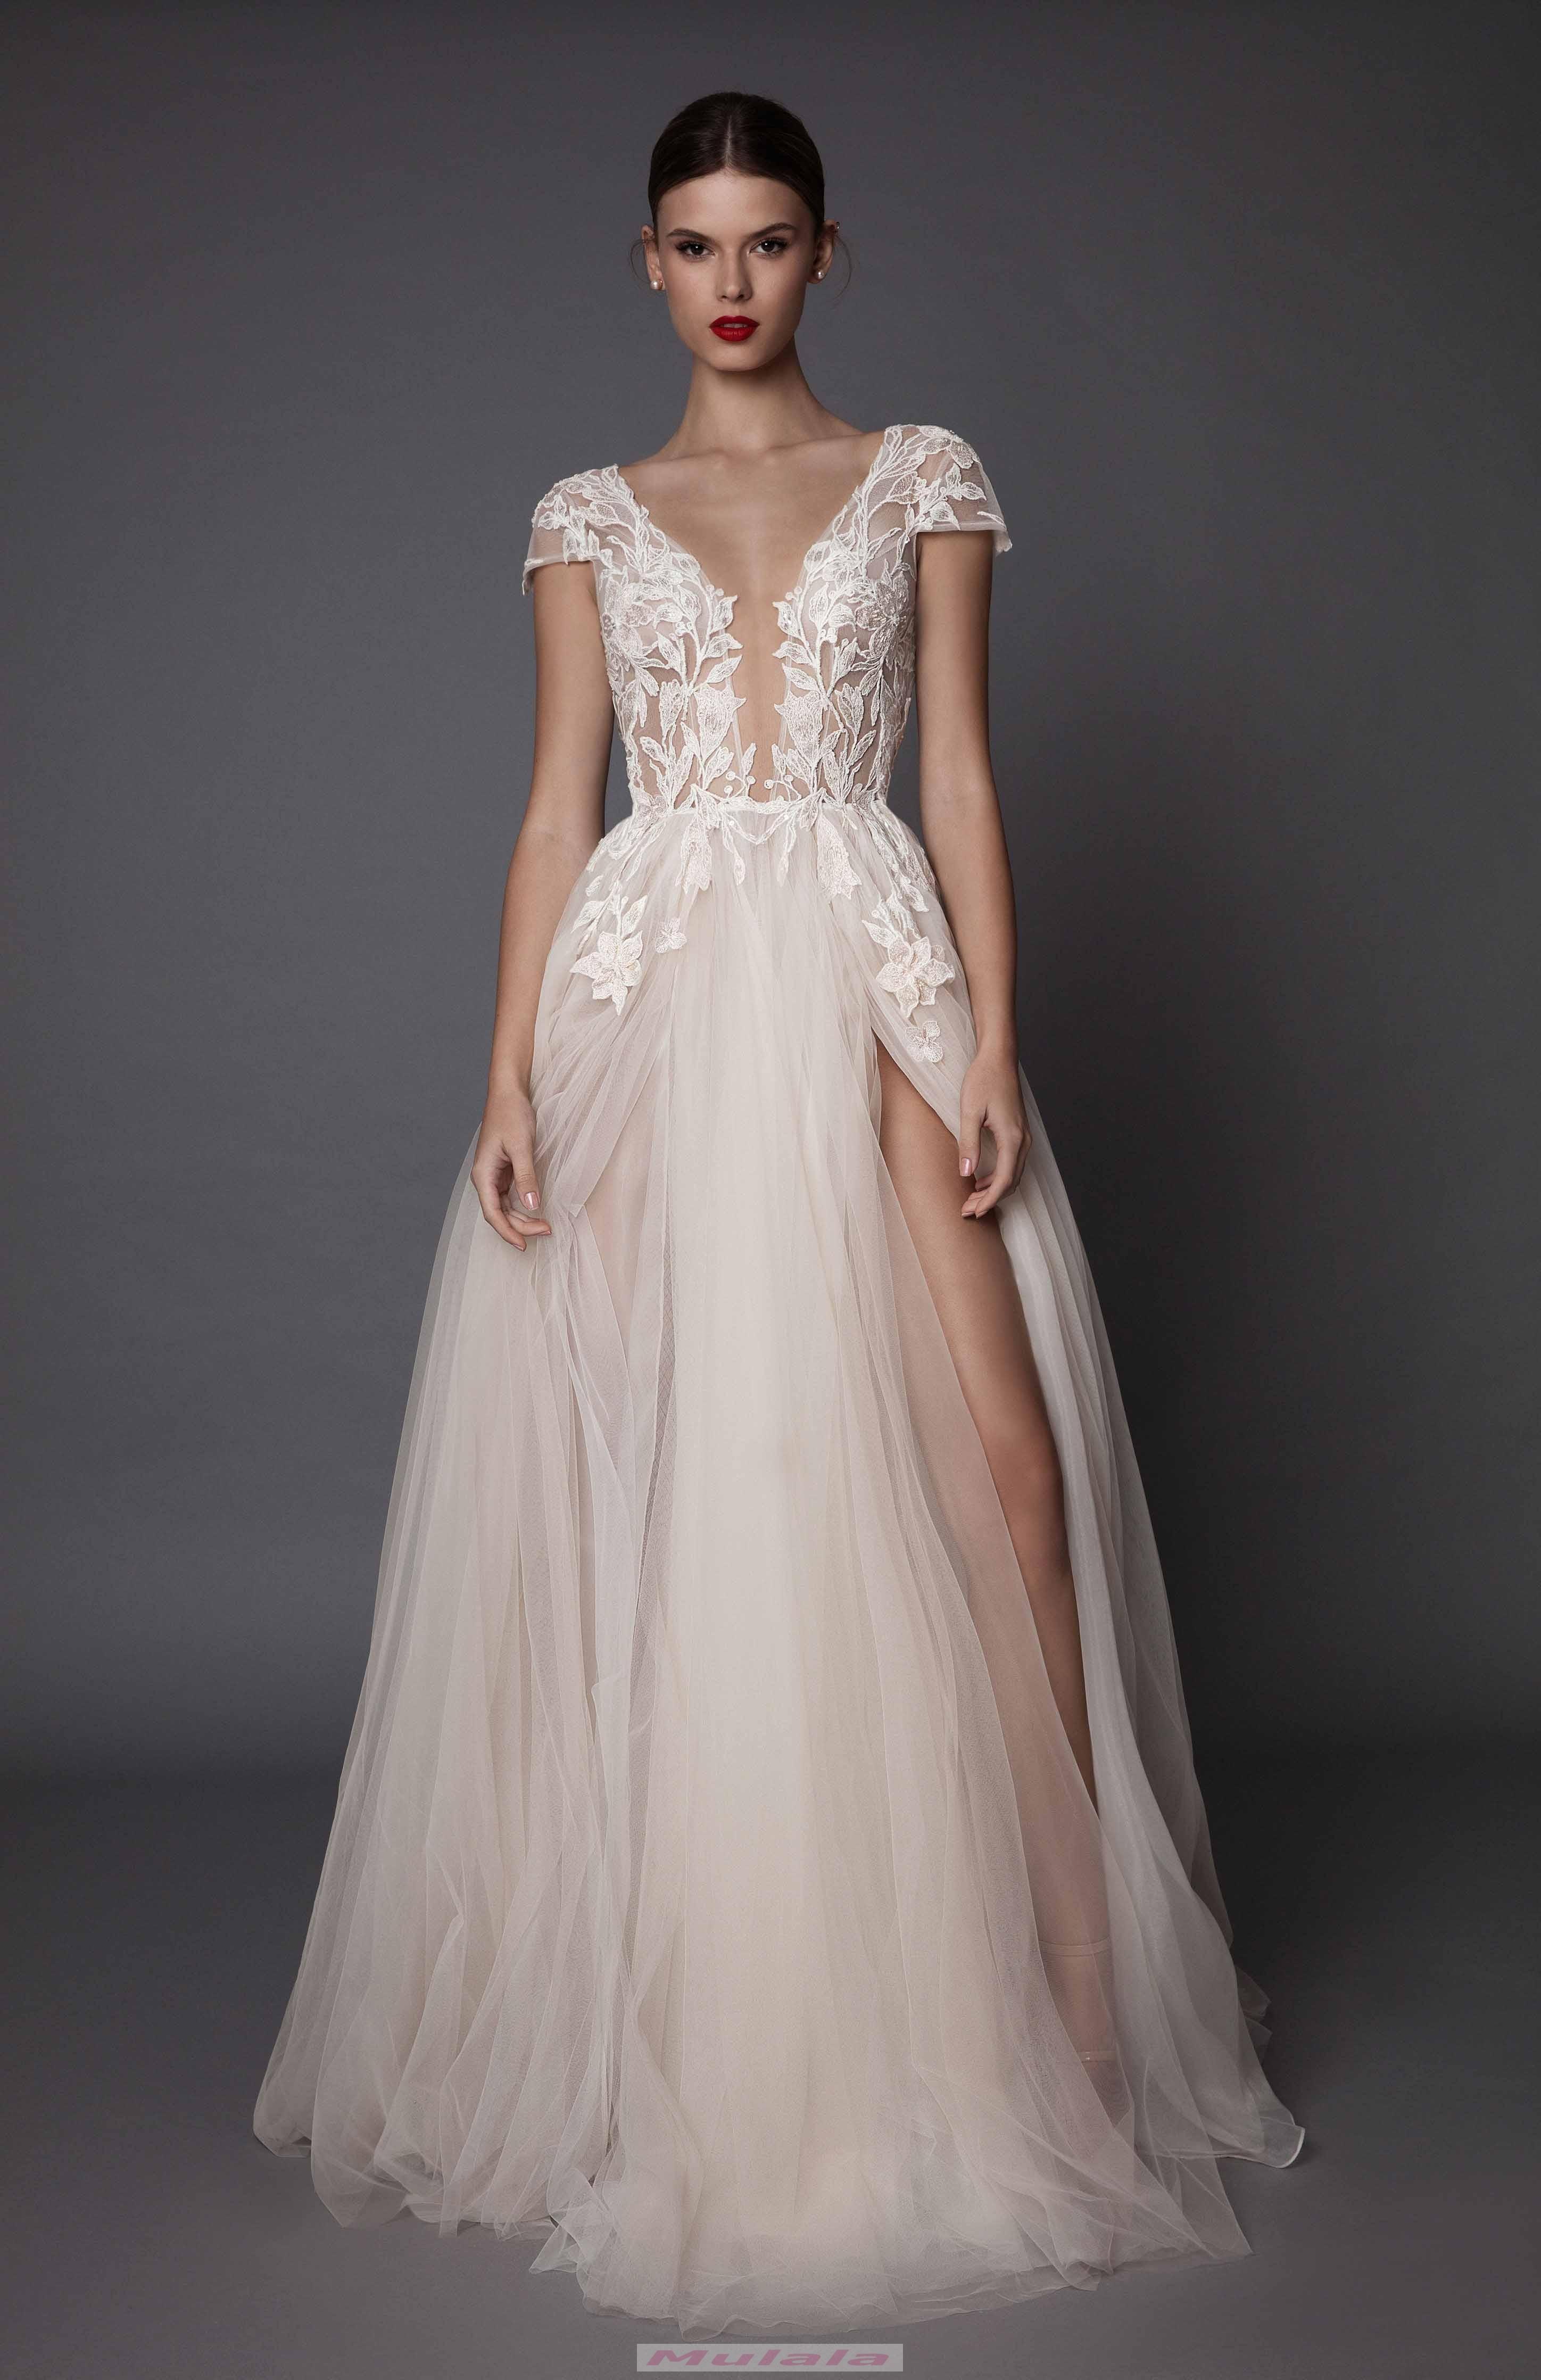 2018 Berta Lace Appliques Prom Dresses Cap Sleeves Deep V Neck Side ...